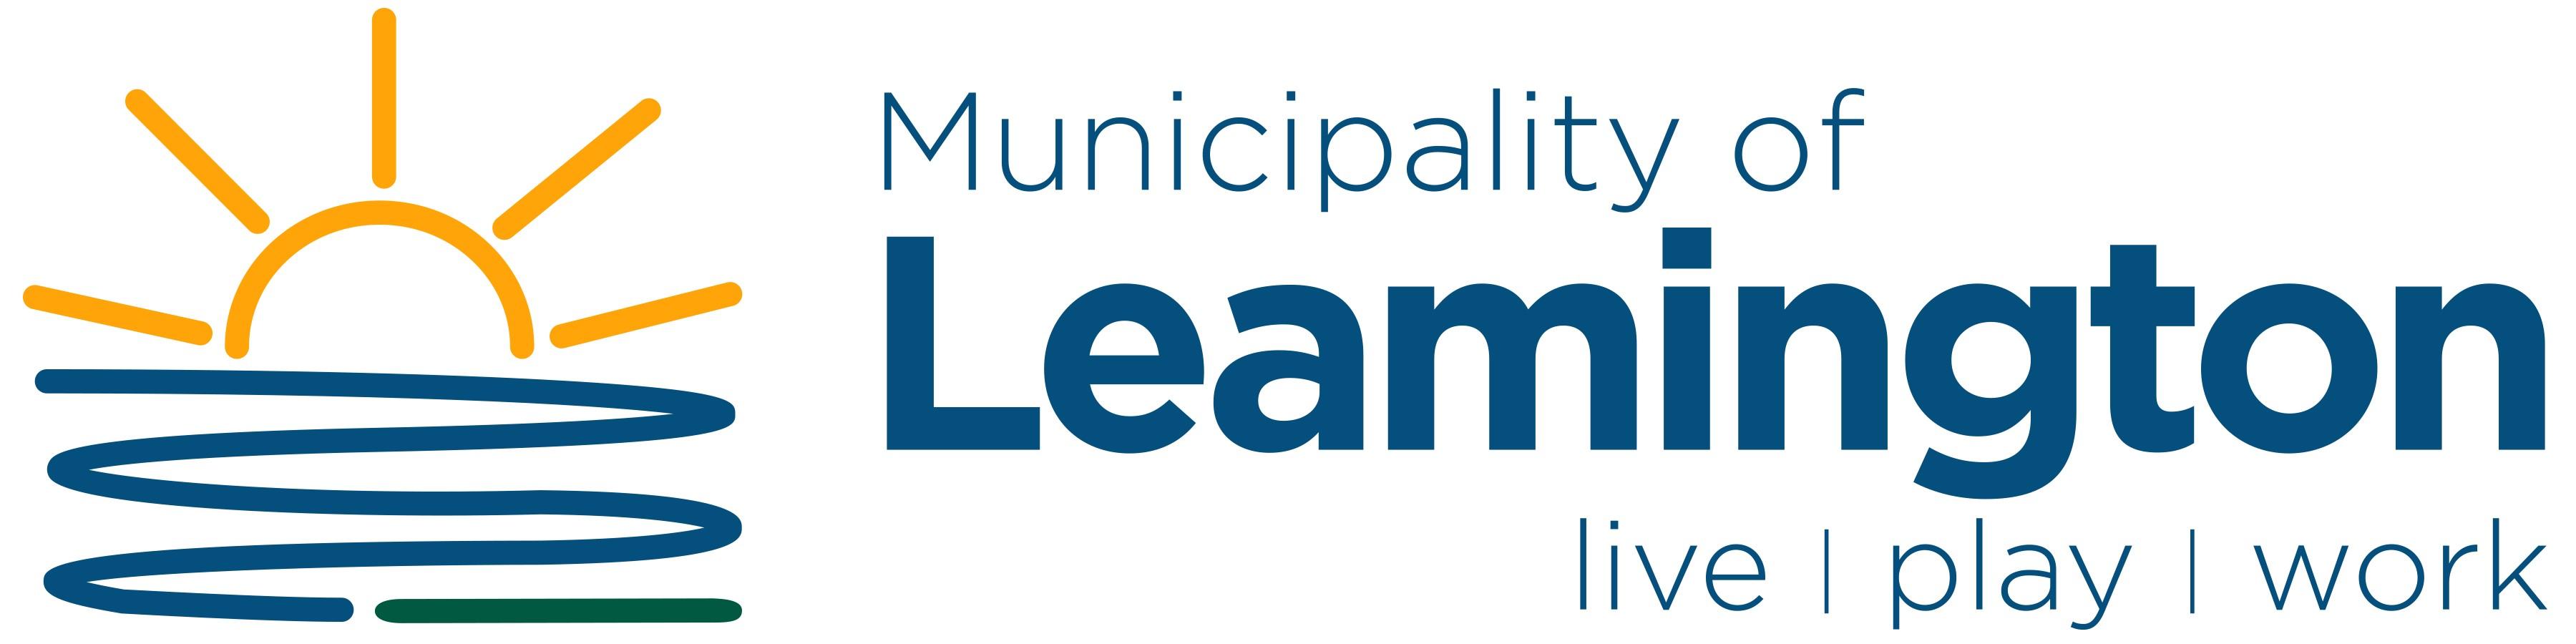 Leamington Municipal Logo